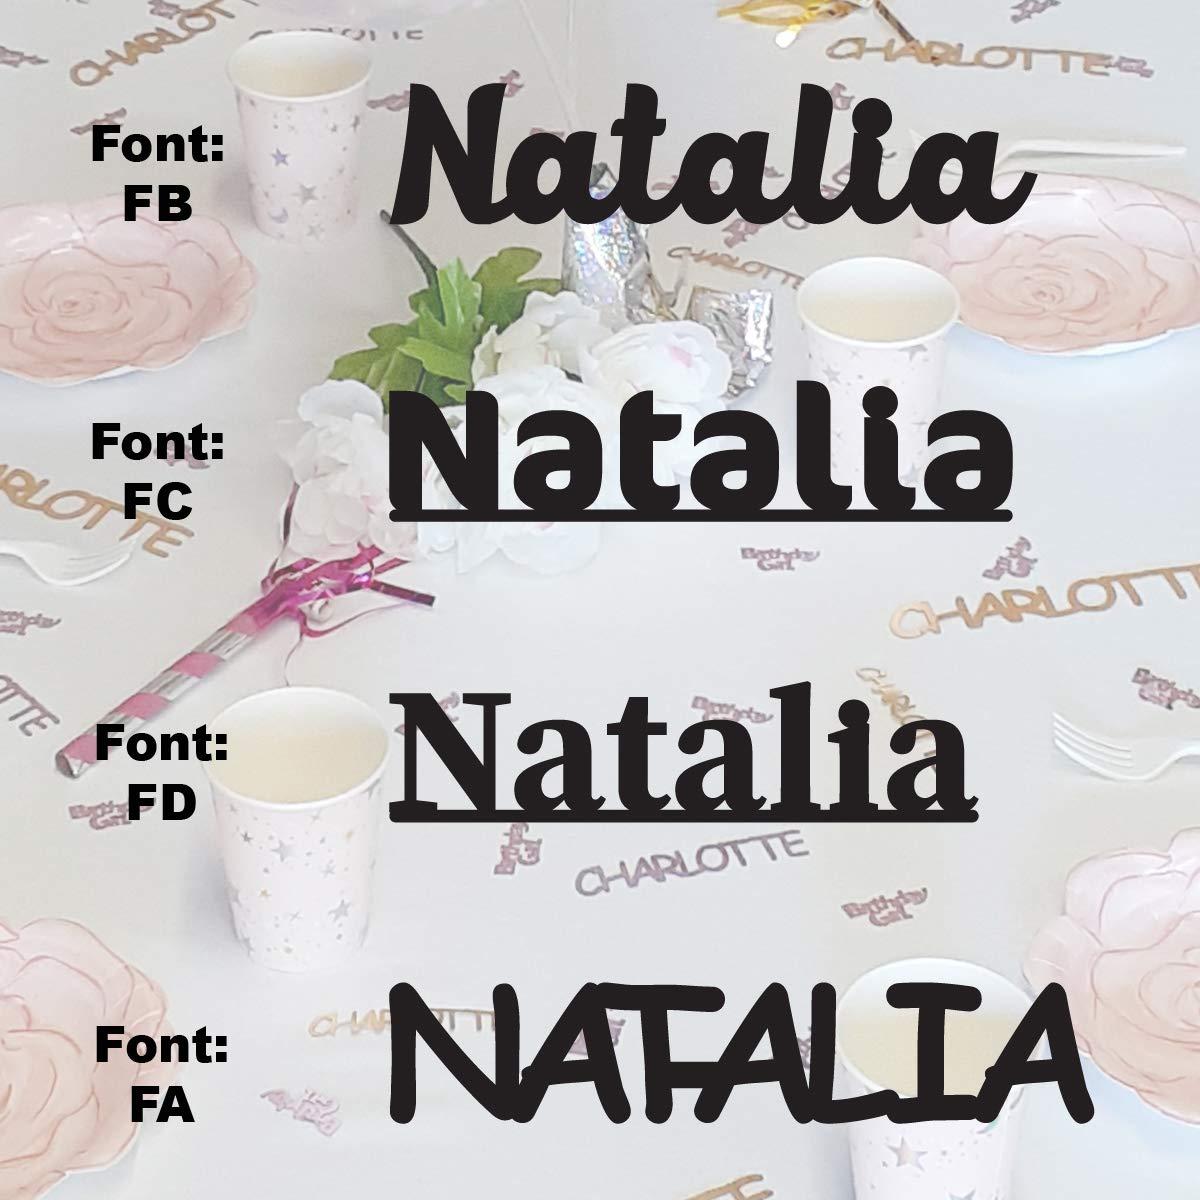 2021 model NATALIA - Name High material Confetti in Metallic Includes 12 Colors.